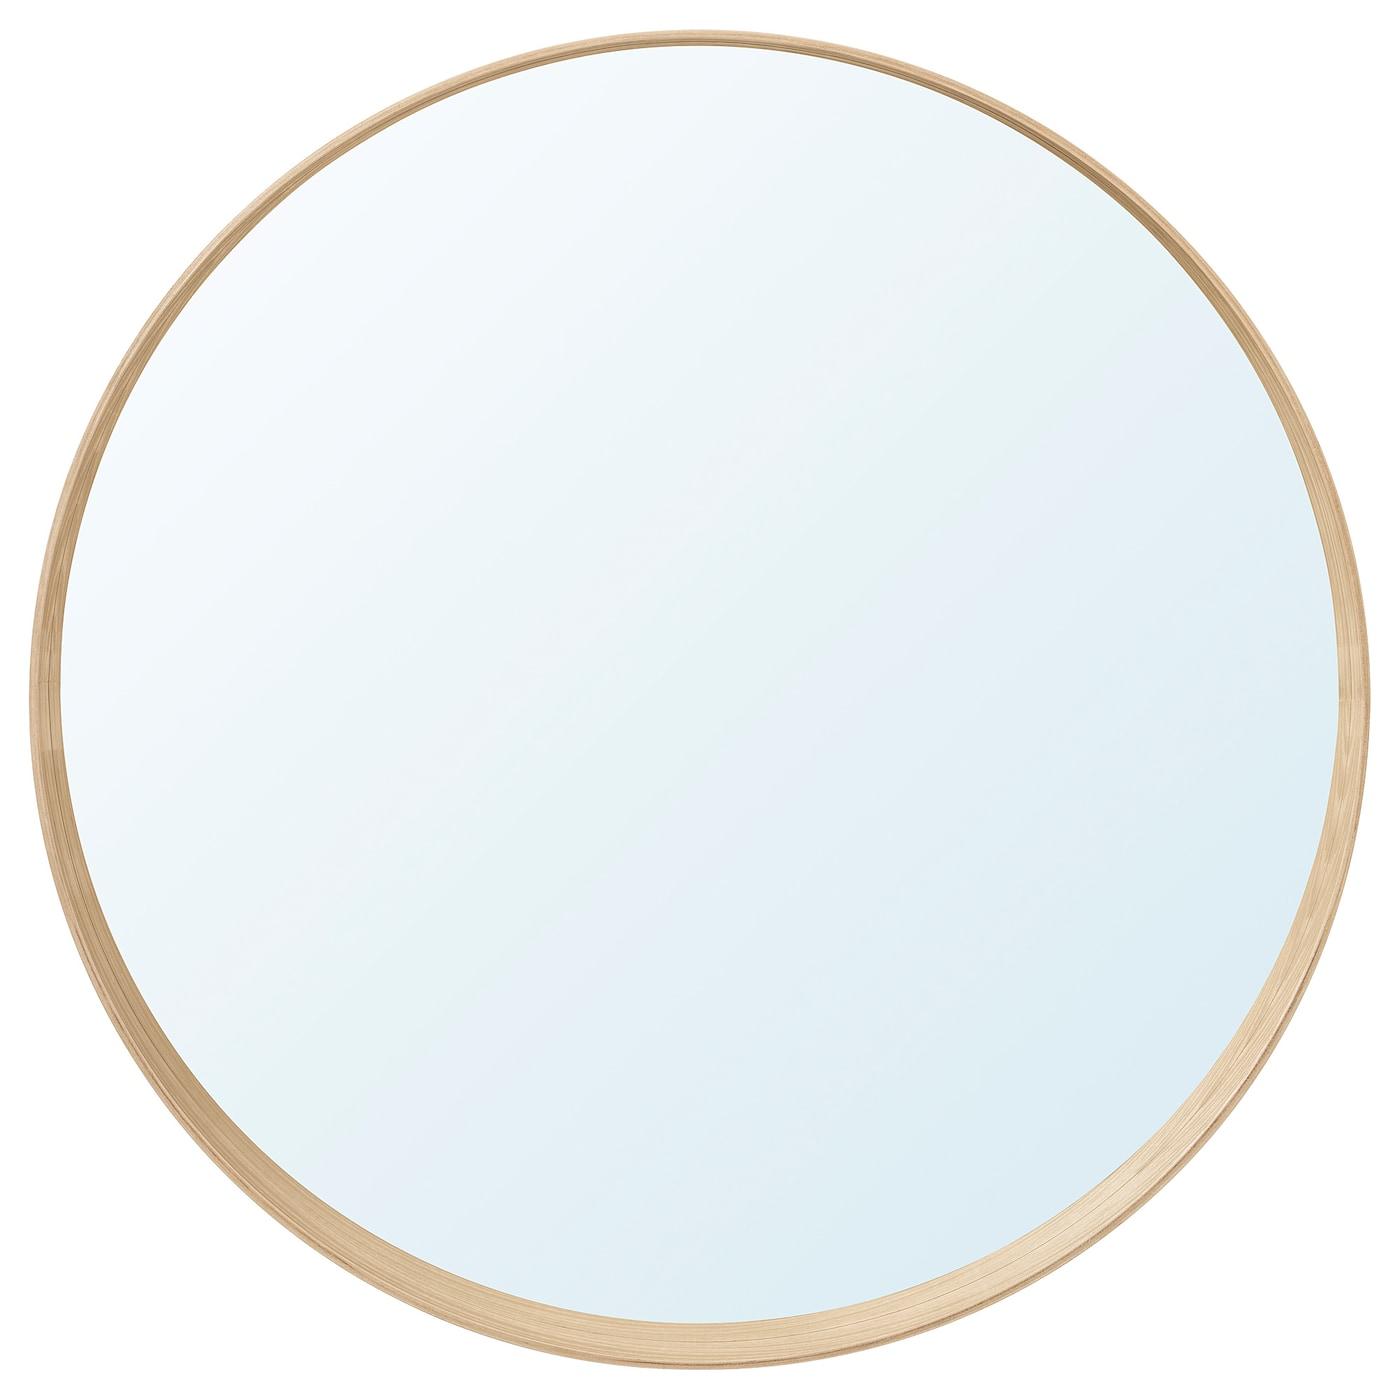 stockholm espejo chapa fresno 80 cm ikea. Black Bedroom Furniture Sets. Home Design Ideas